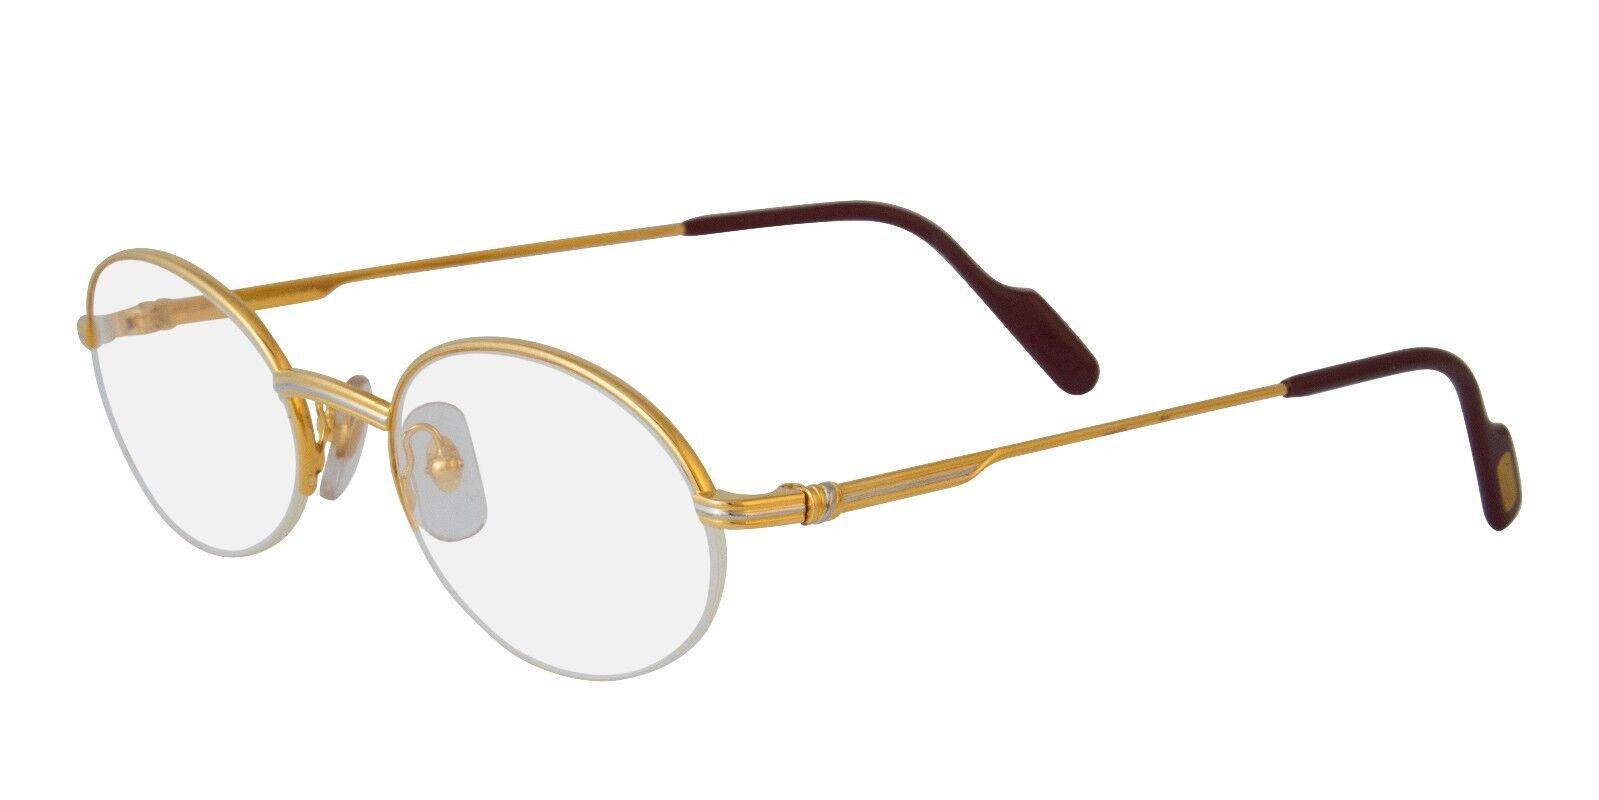 a81bac0c51c0 Cartier Eyeglasses T8100354 Gold Round Optical Frame France 51mm ...